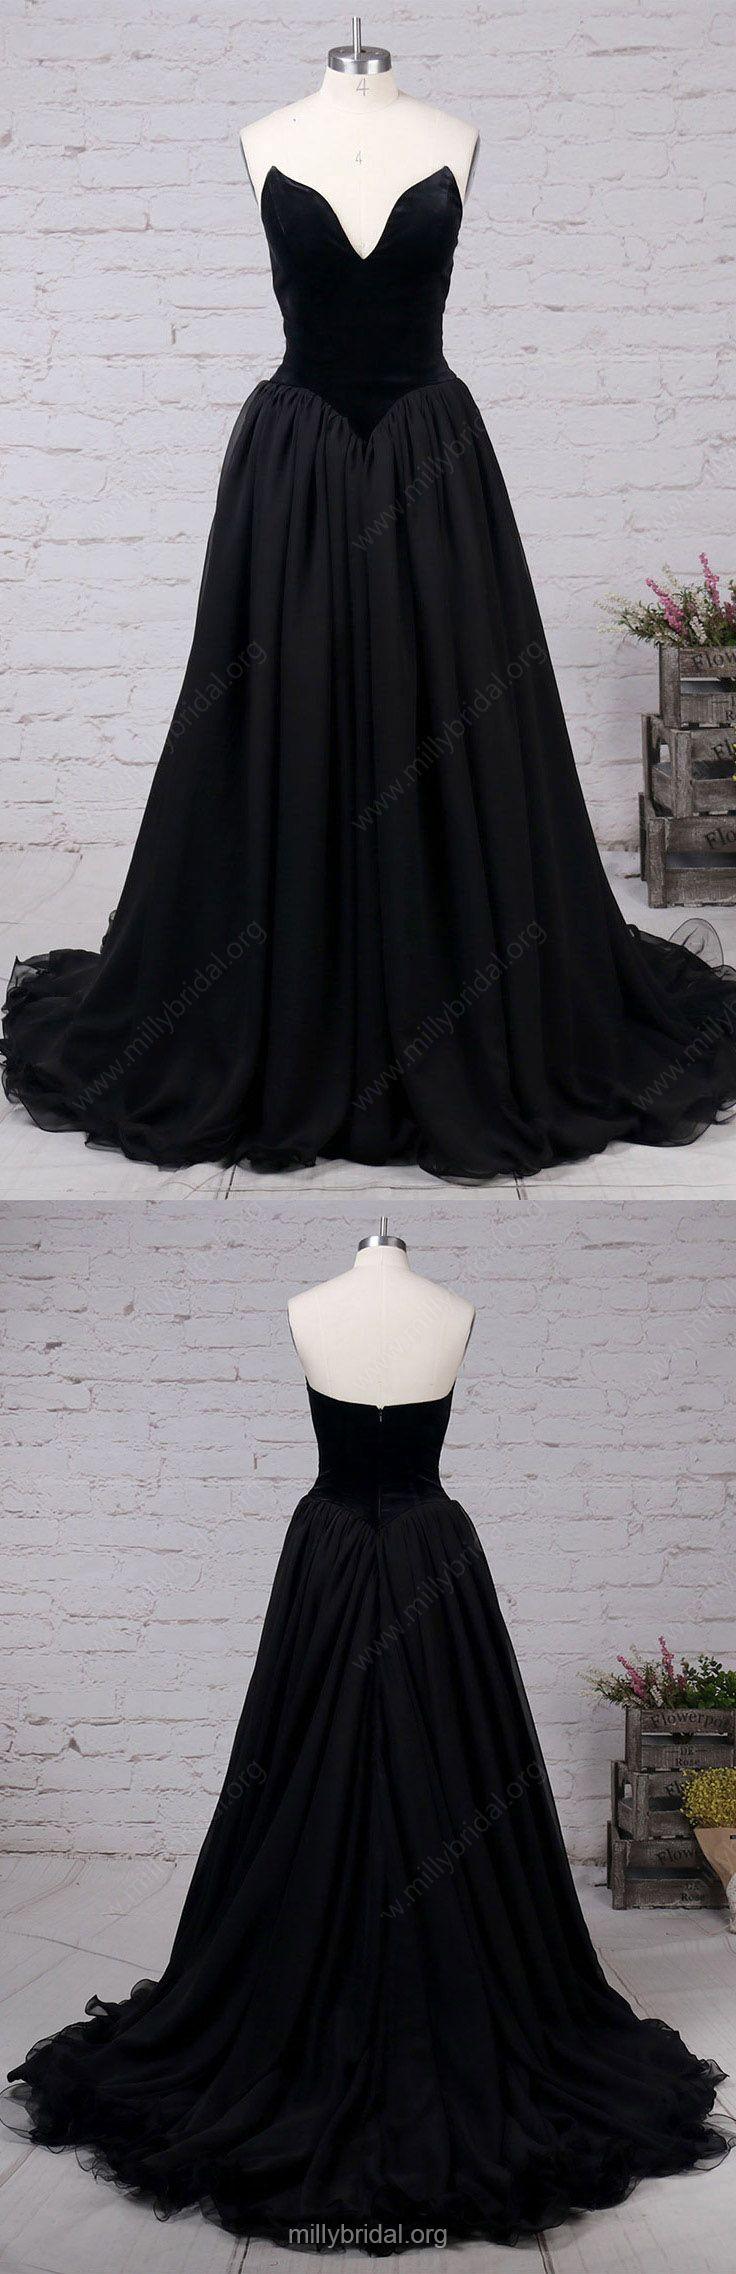 Black prom dressesball gown prom dresses prom dresses for